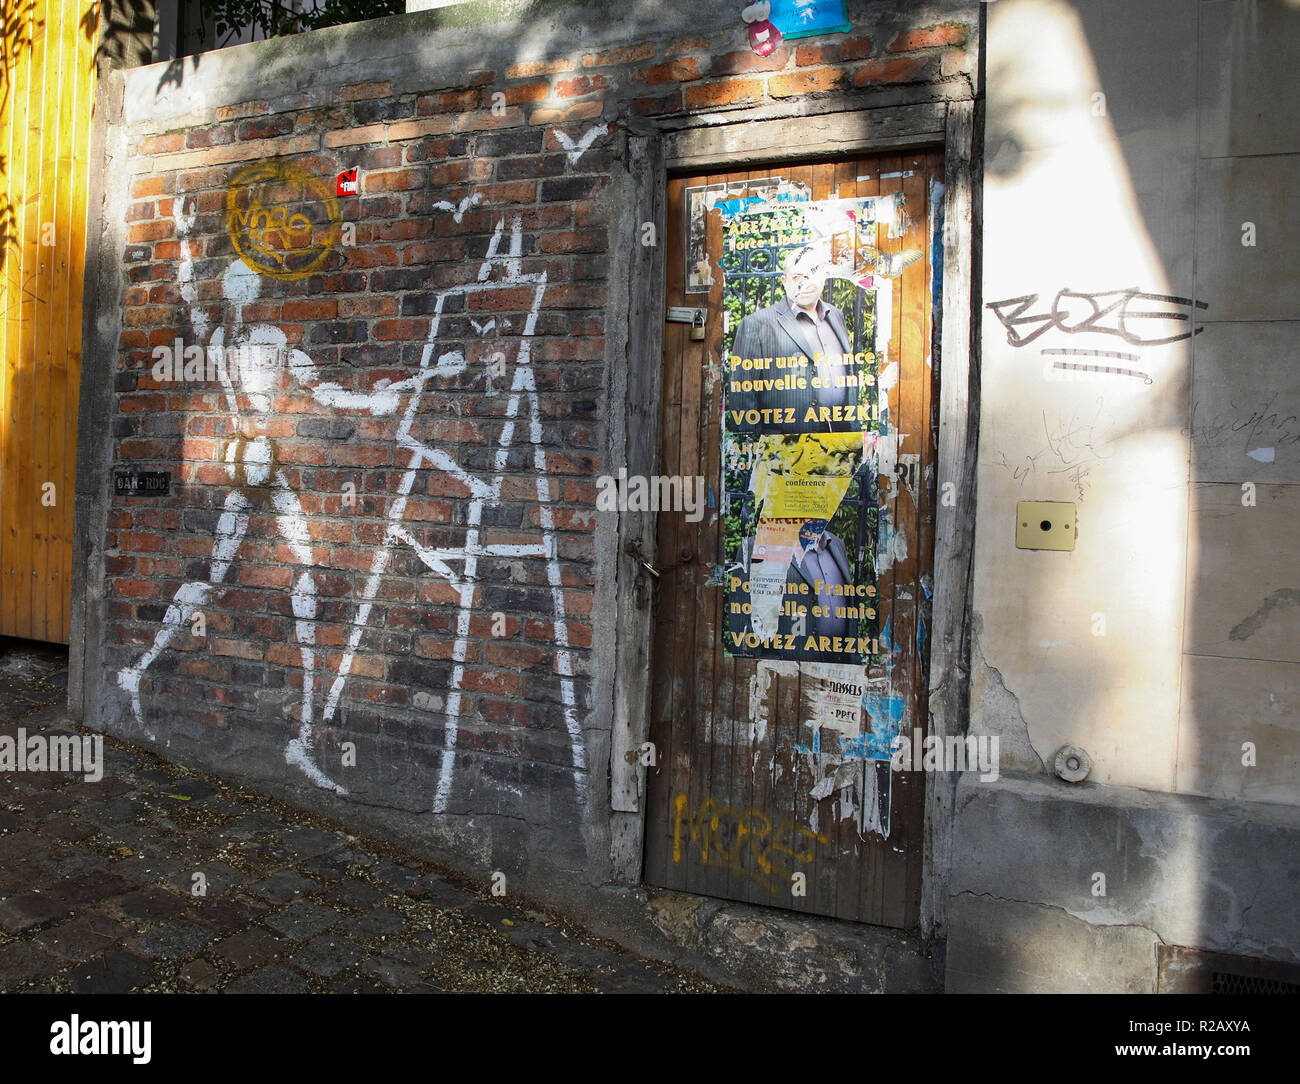 FRANCE Paris Montmartre graffitti at wall 2007 - Stock Image